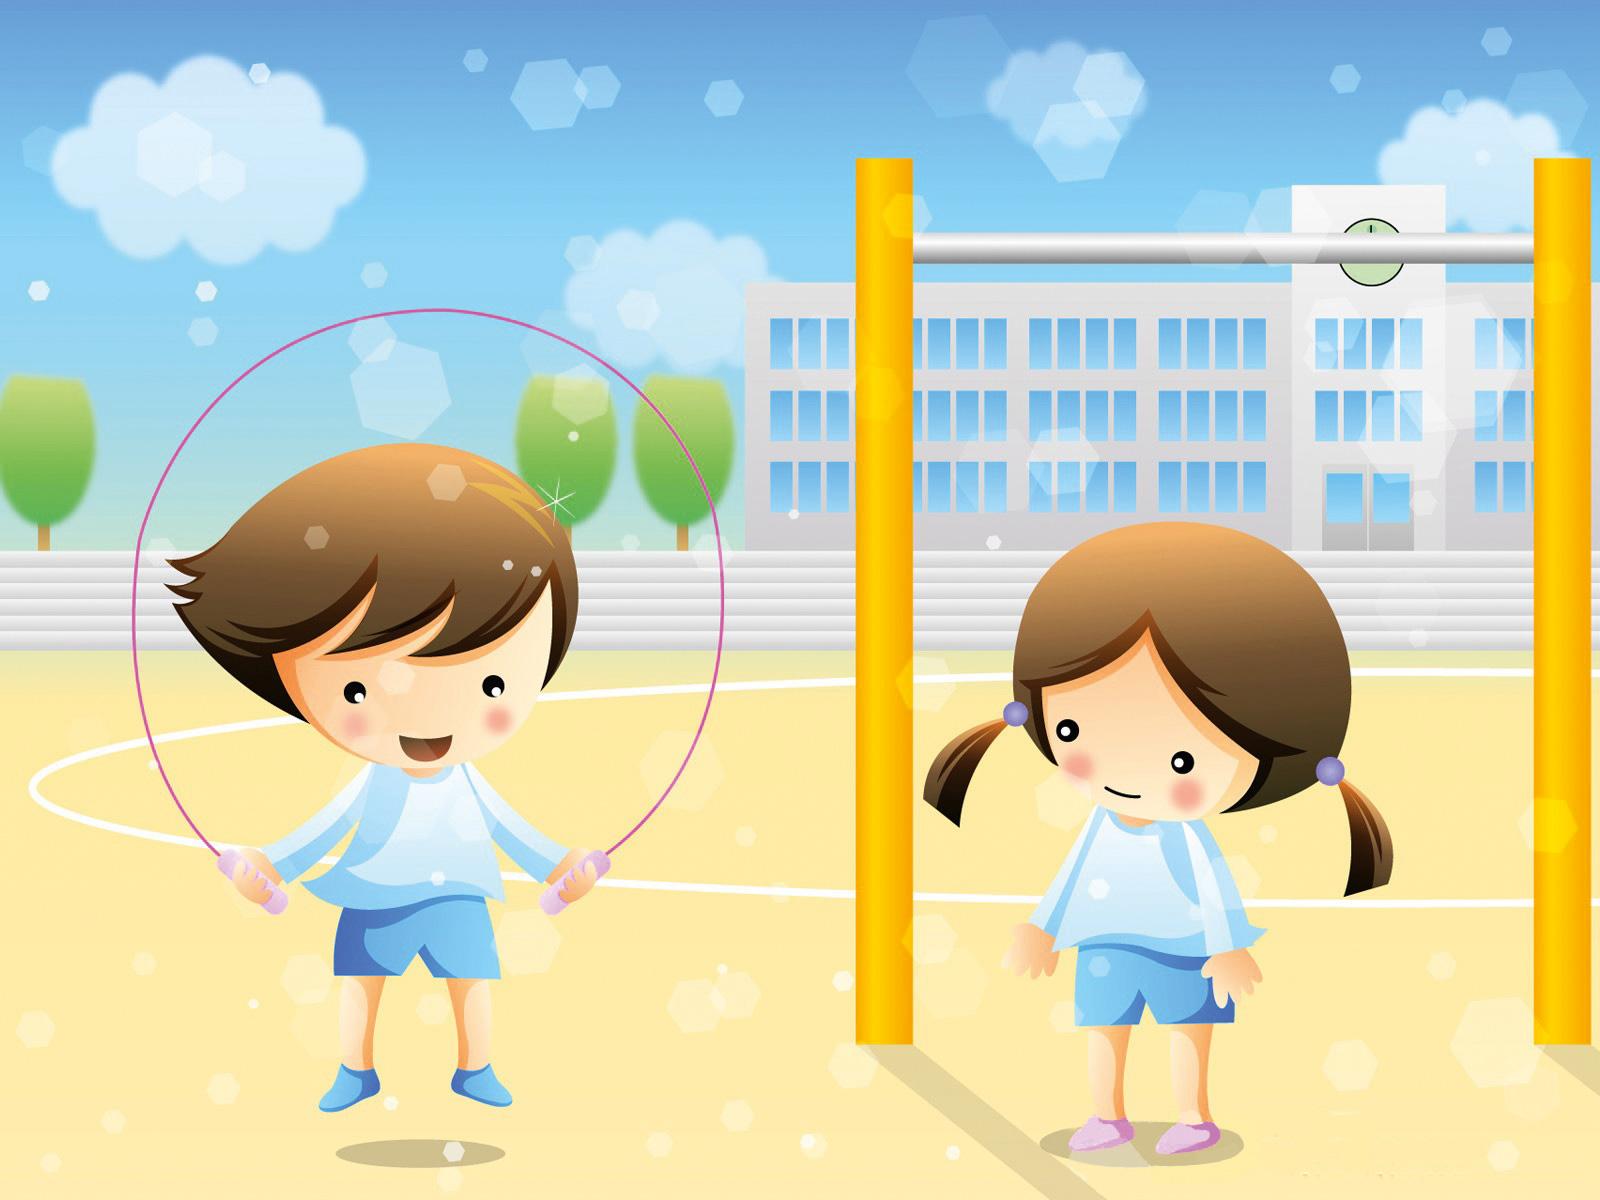 método montessori: menino e menina a salta à corda